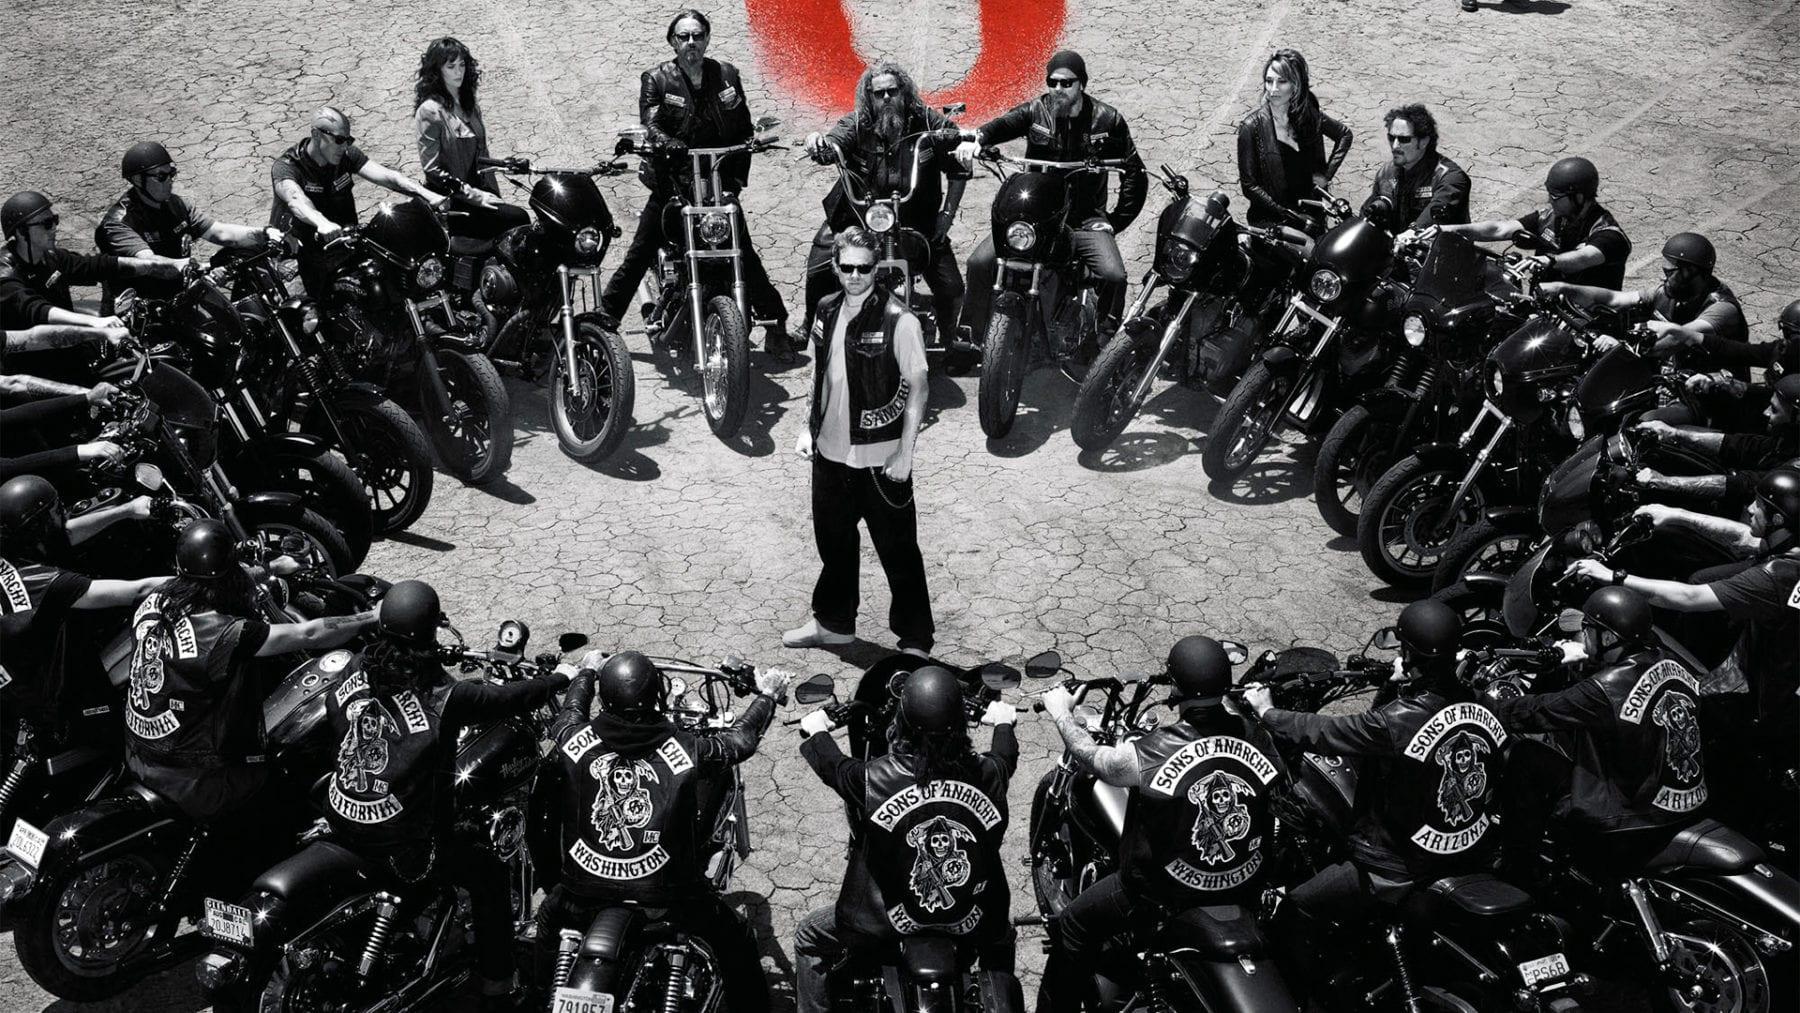 Kurt Sutter explica por qué Sons of Anarchy ha sido retirado de Netflix